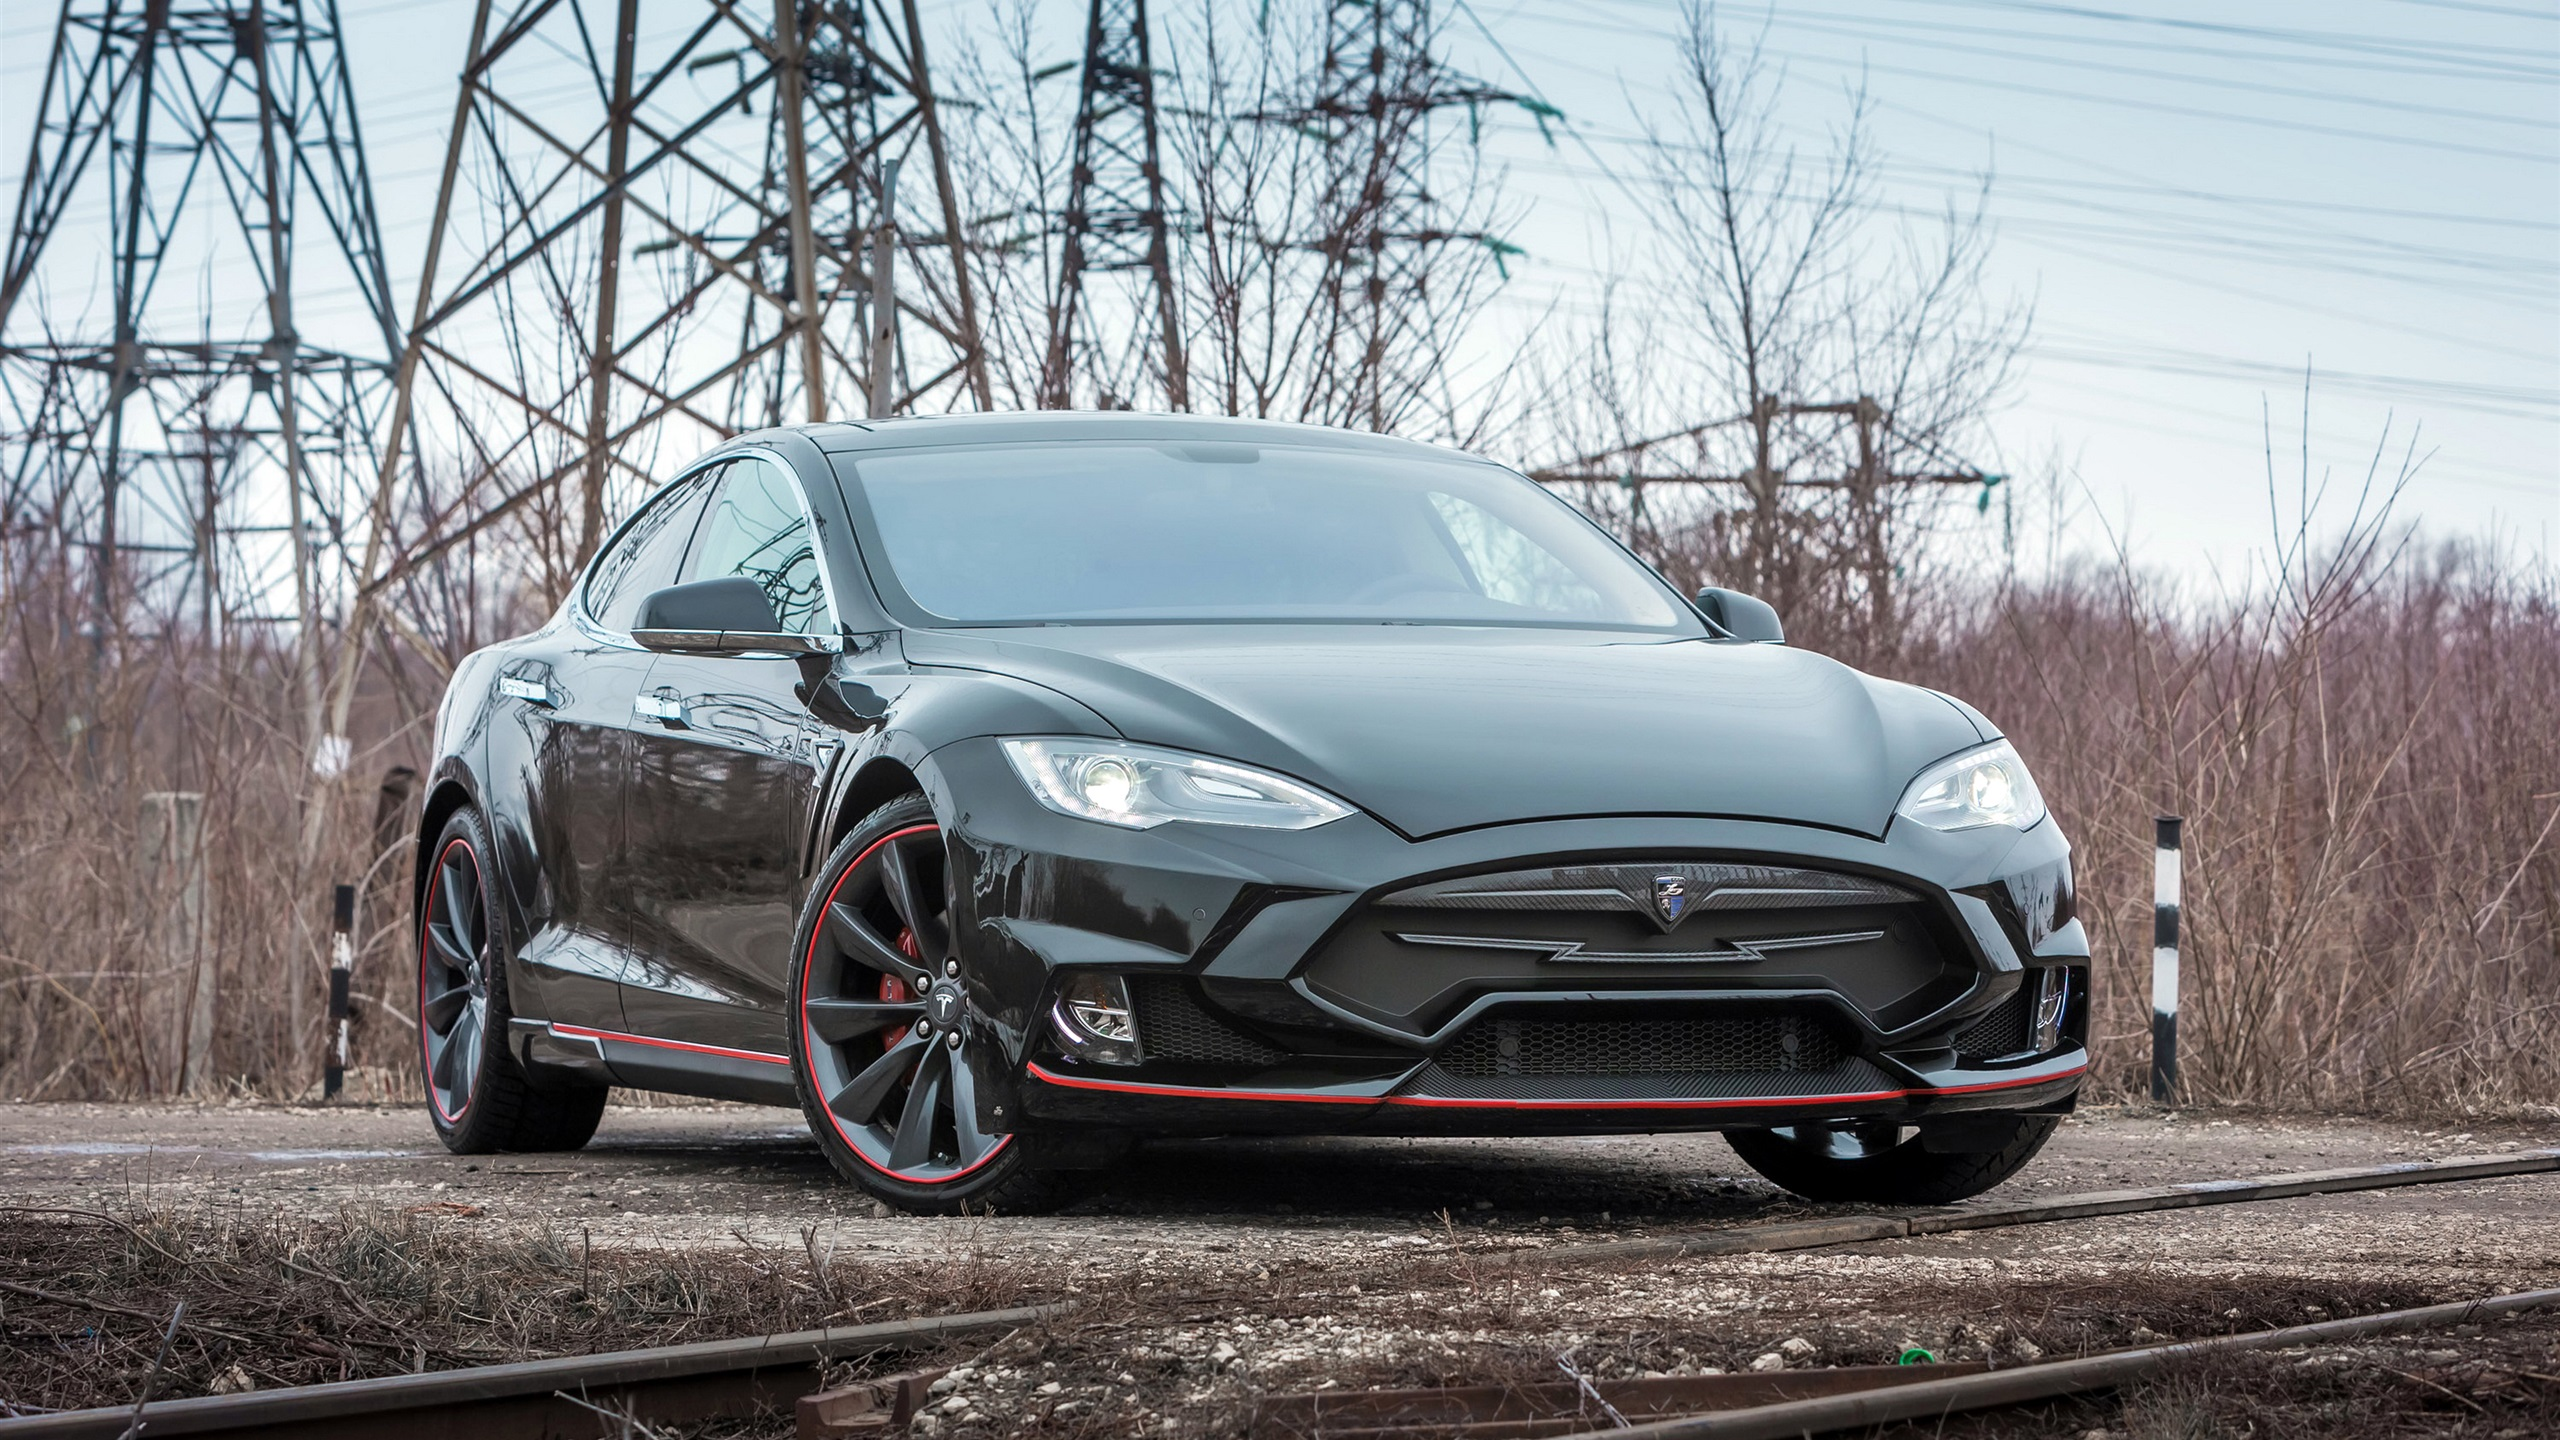 wallpaper tesla model s black electric car front view 3840x2160 uhd